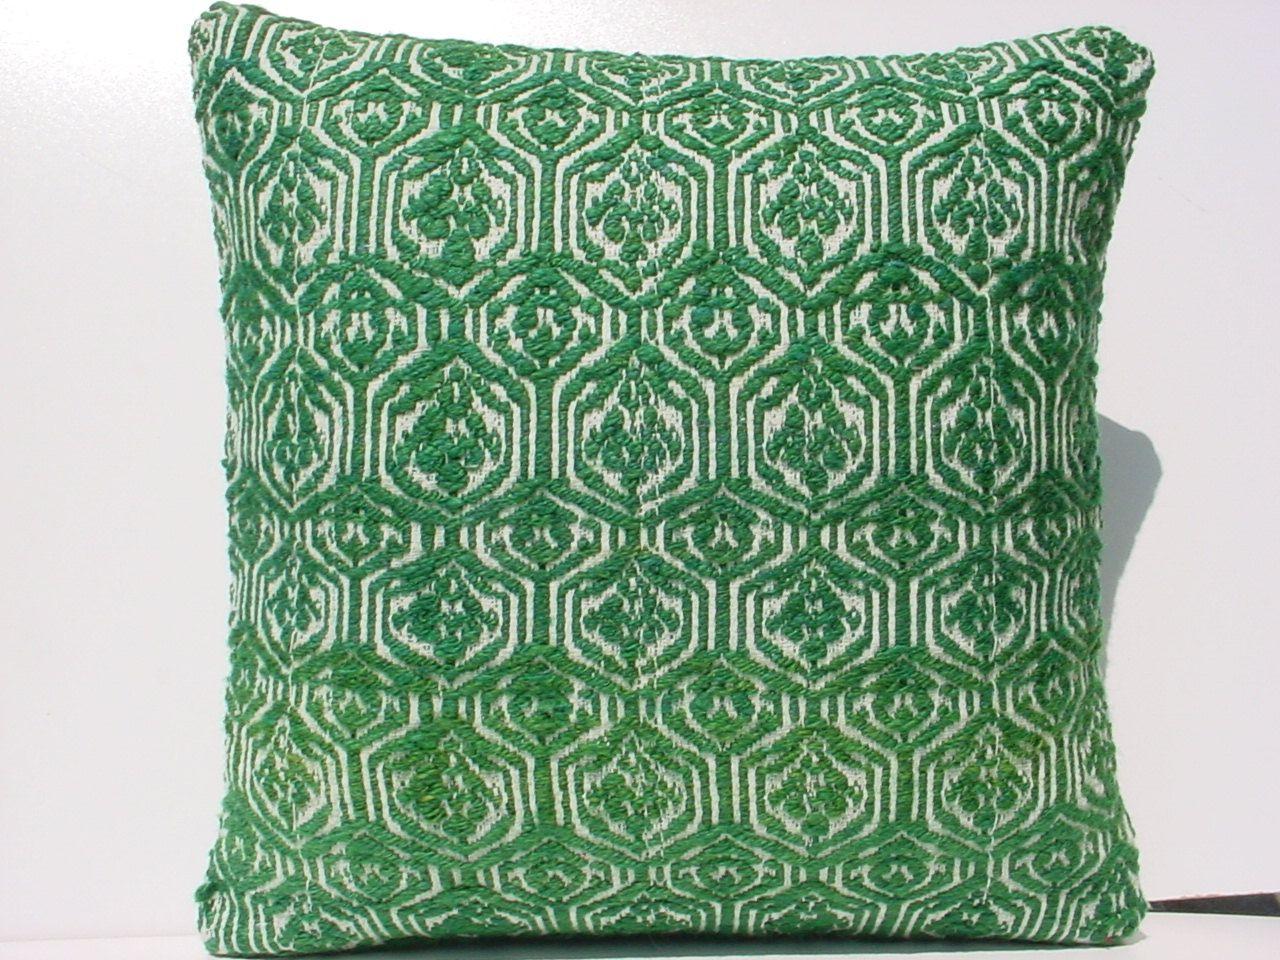 Bohemian home furnishings | ORGANIC Modern Bohemian Home Decor,Turkish Kilim Pillow Cover 16 X 16 ...